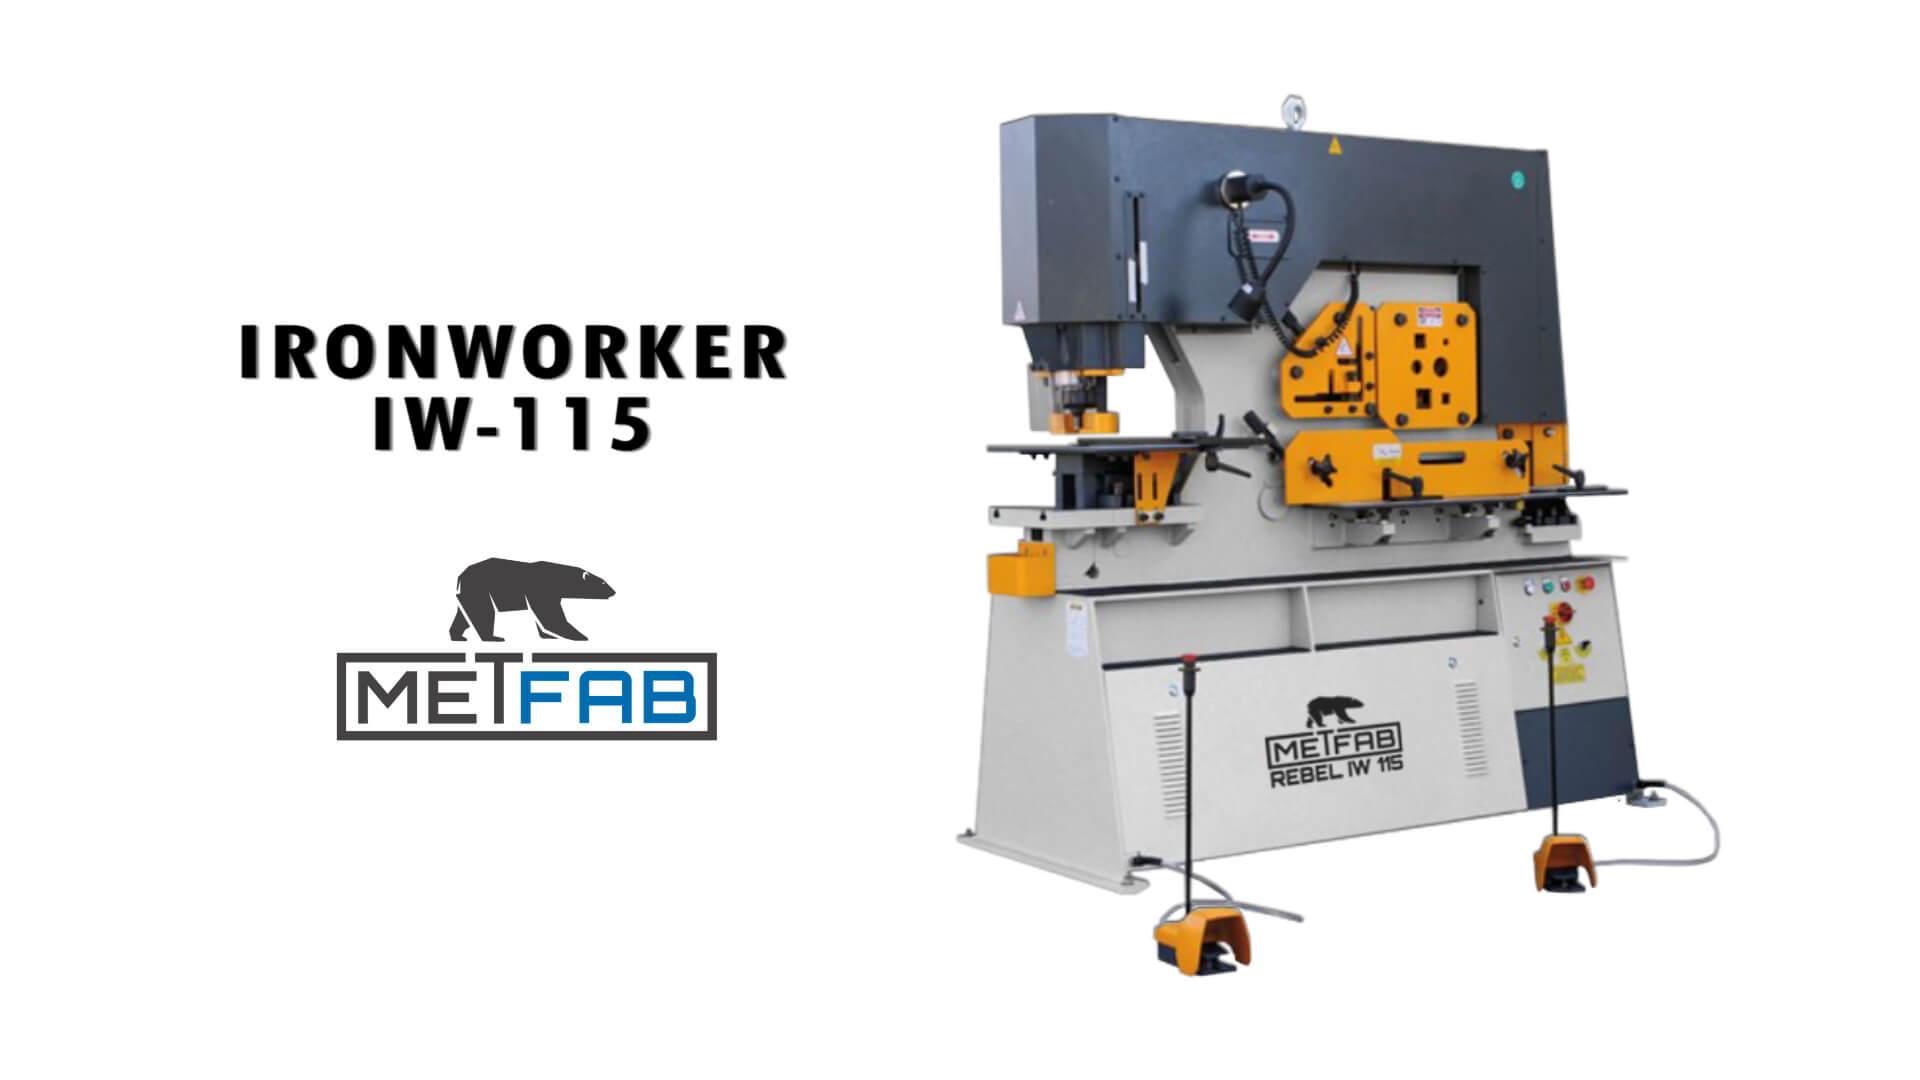 ironworker IW 115 Rebel Metfab